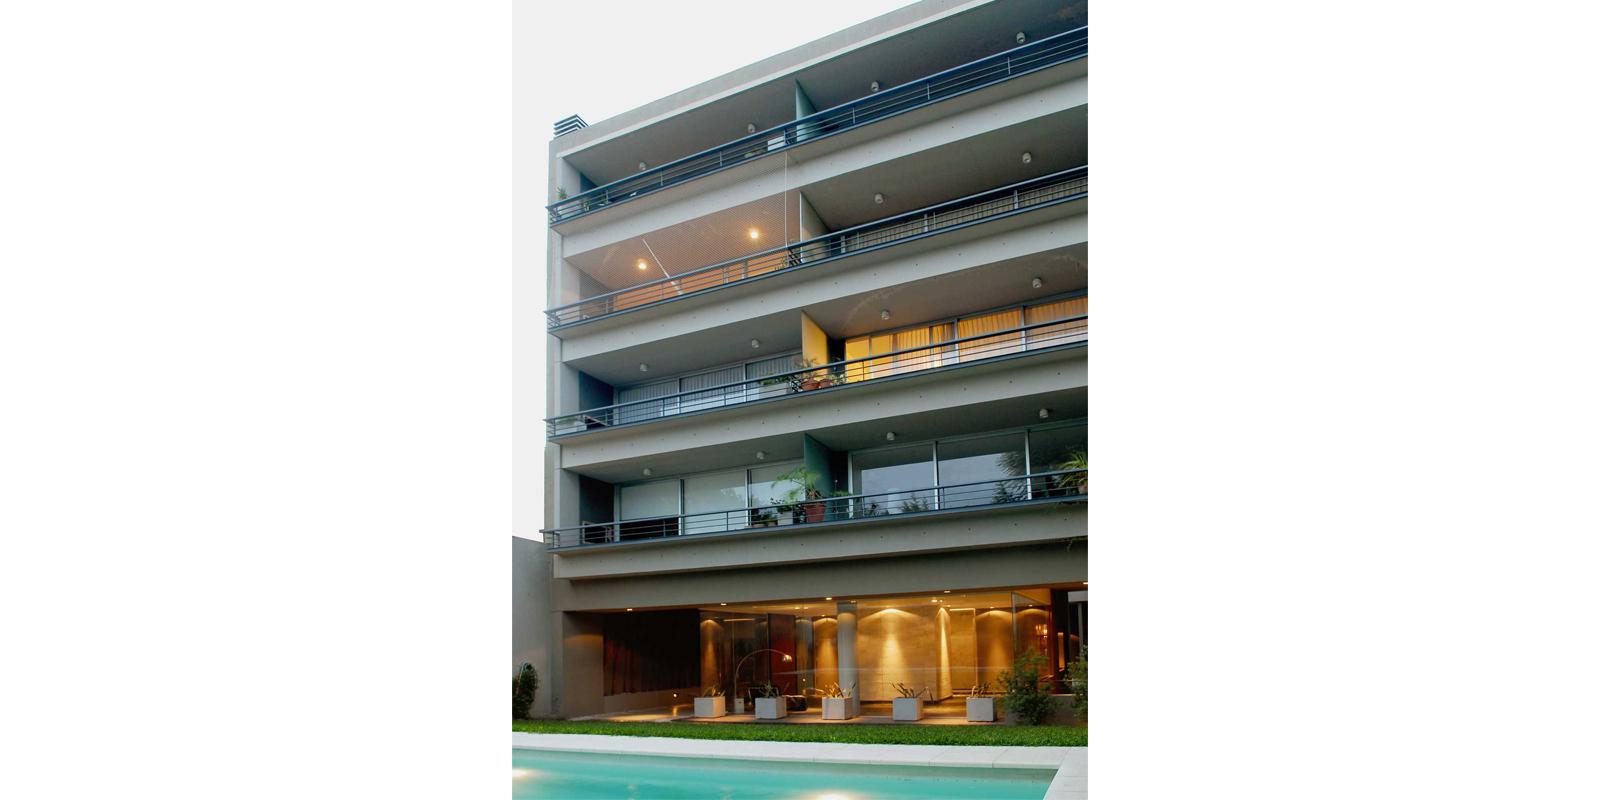 ProyectoC_Arquitectos_Portfolio_01_Ricardo Gutierrez